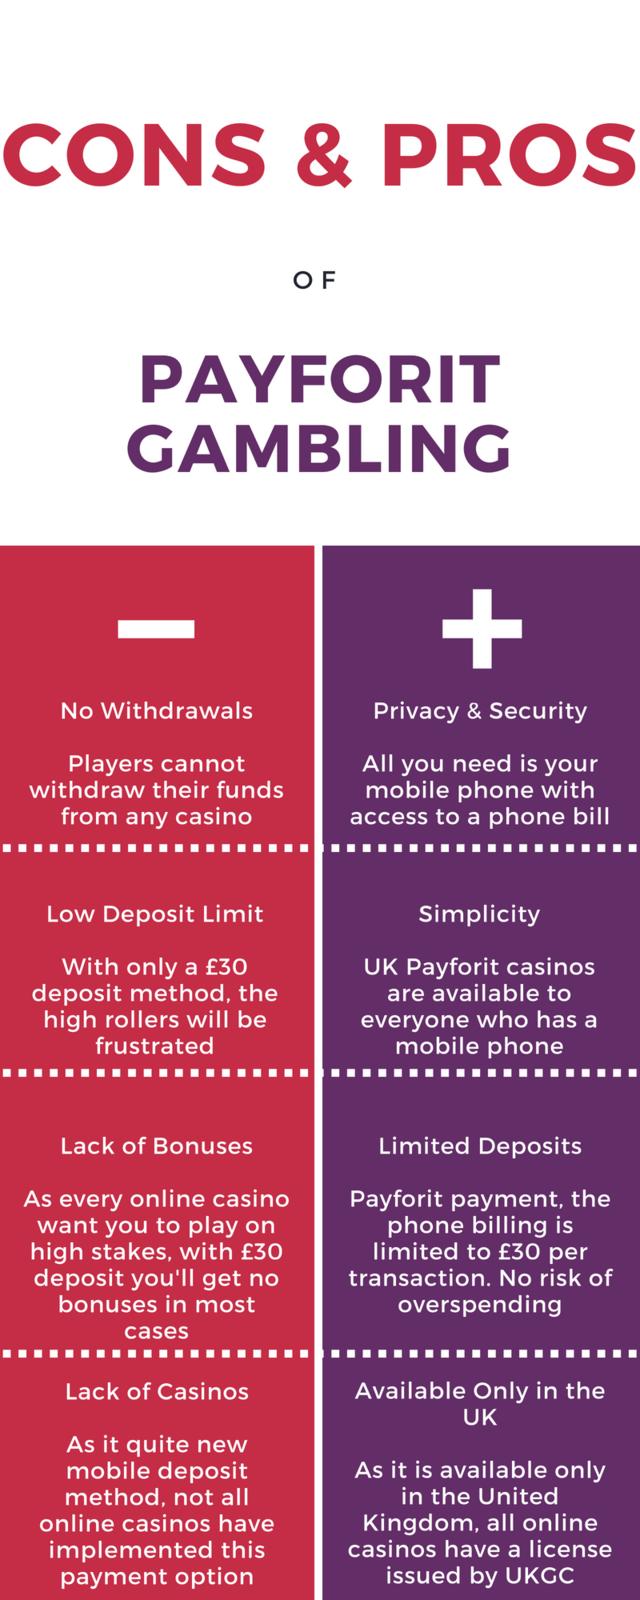 Features of payforit gambling